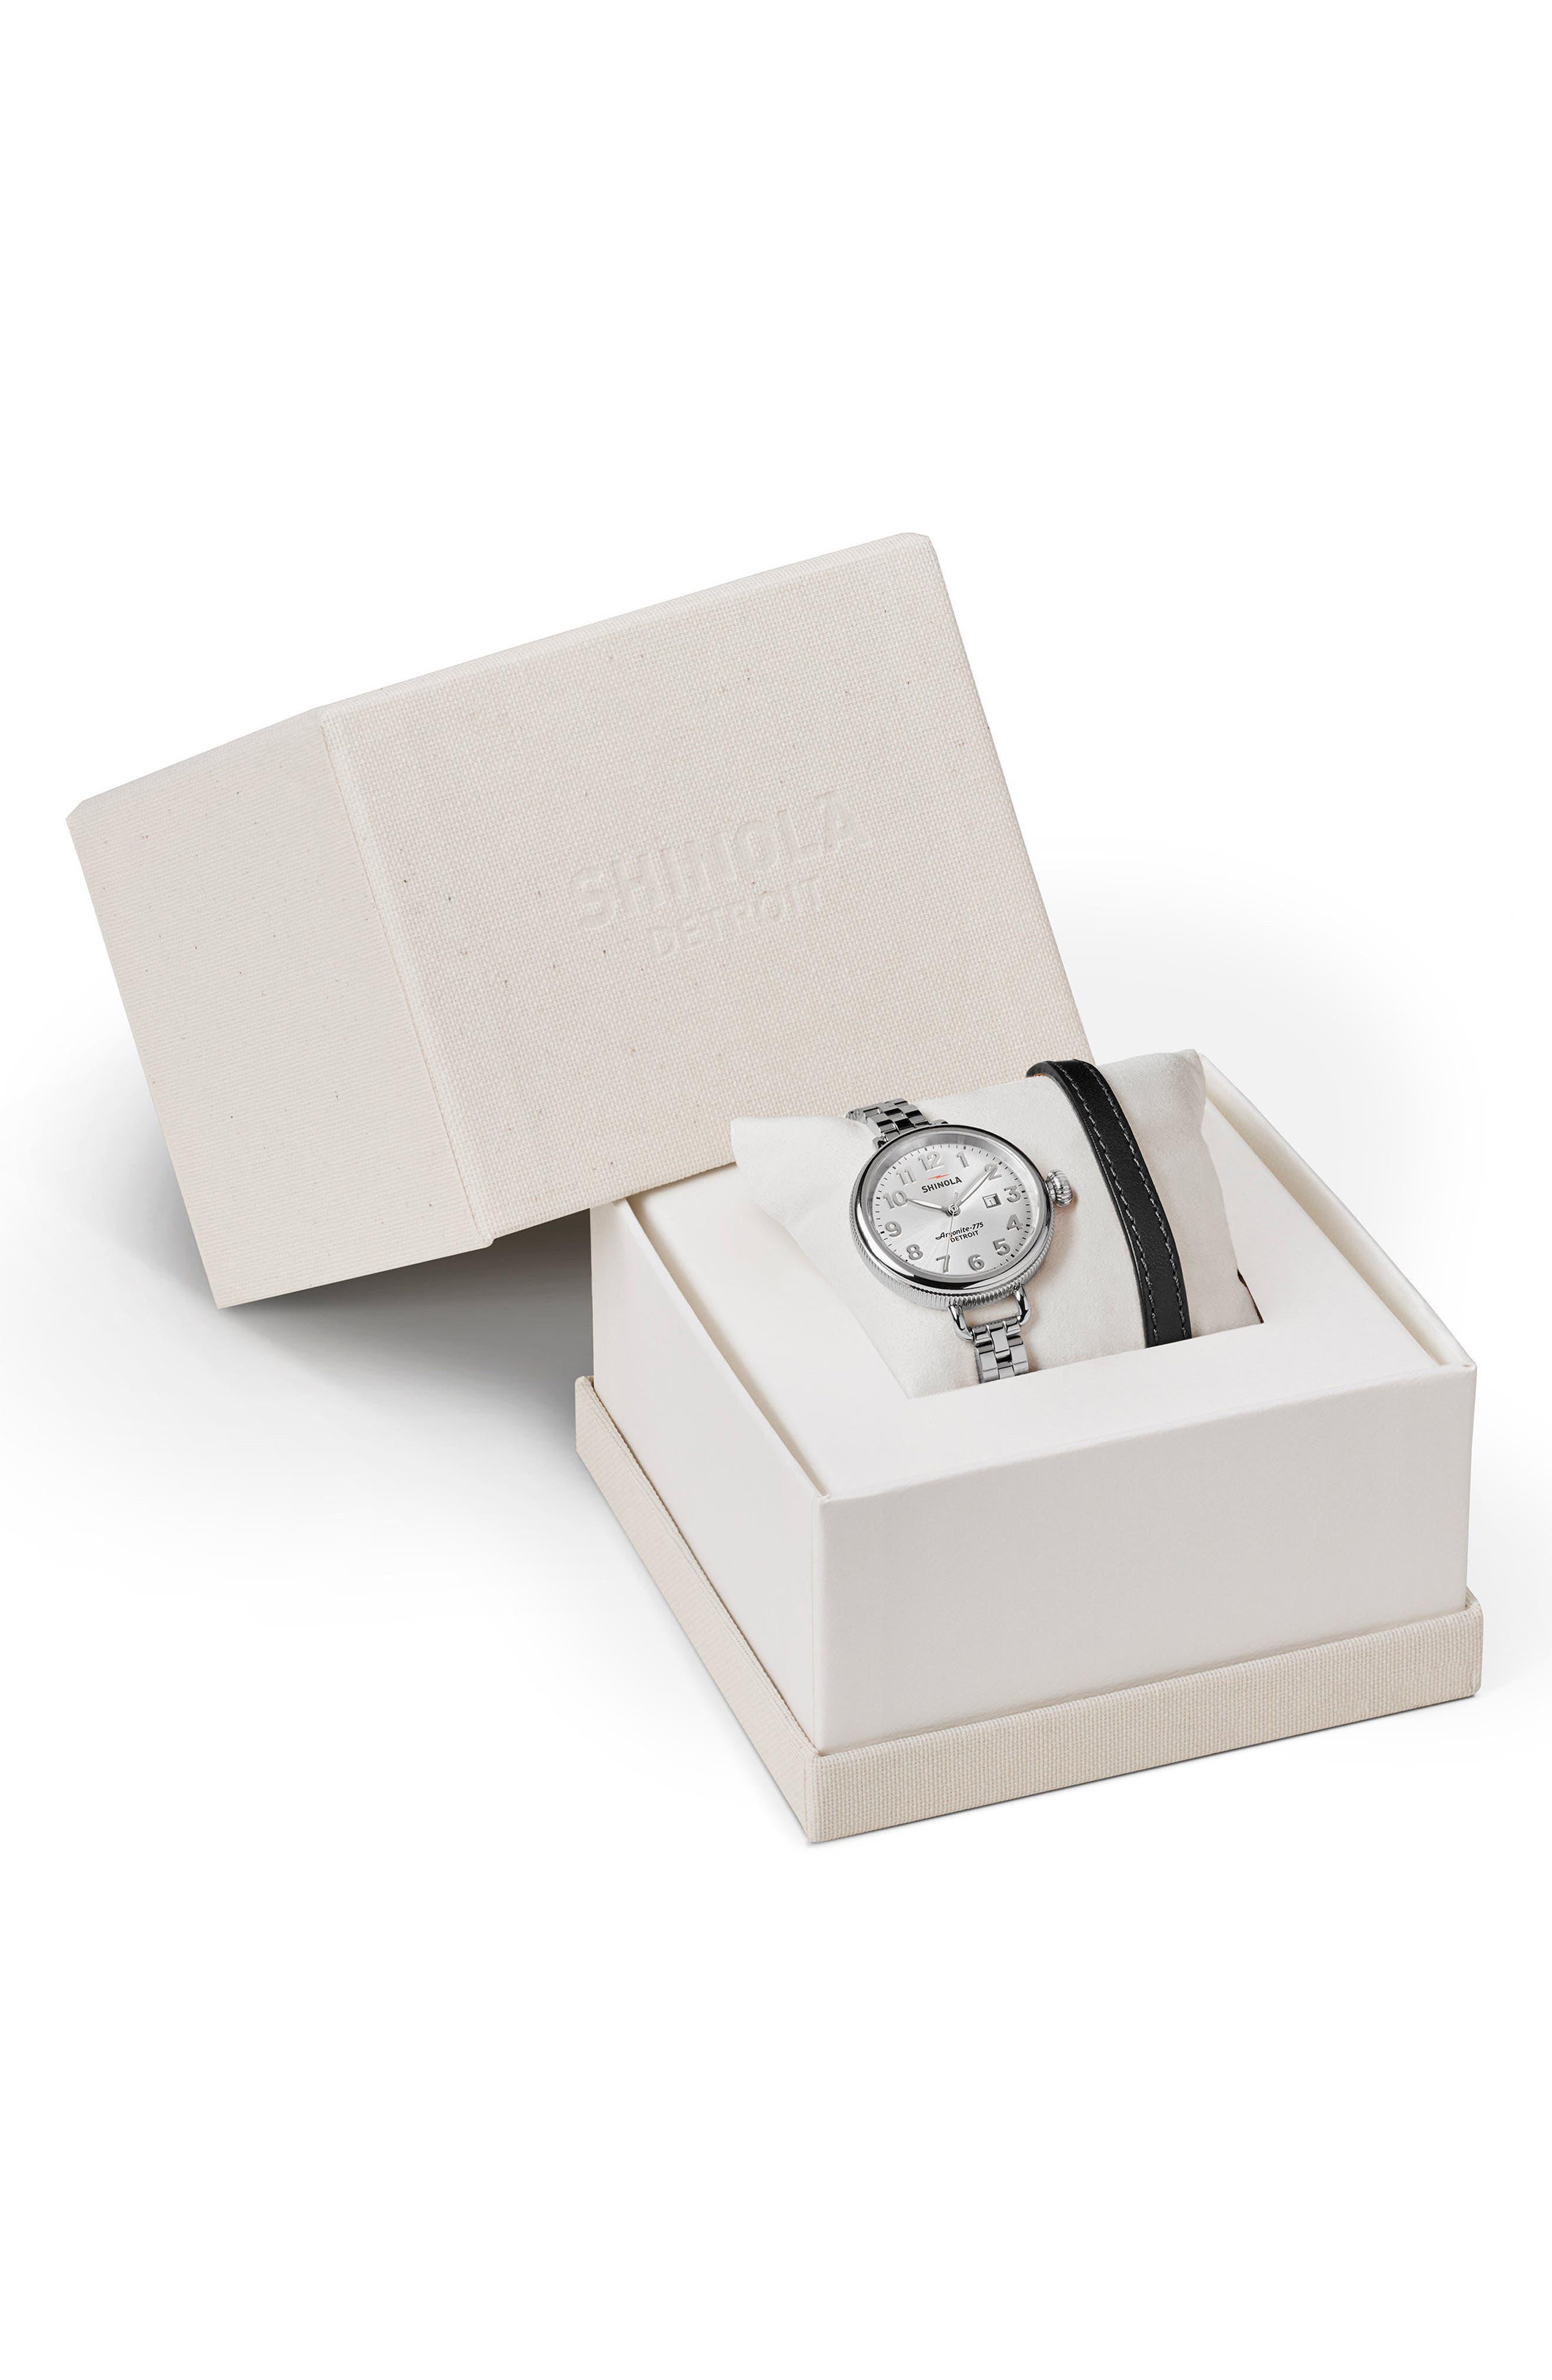 Shinola The Birdy Watch Gift Set, 34mm